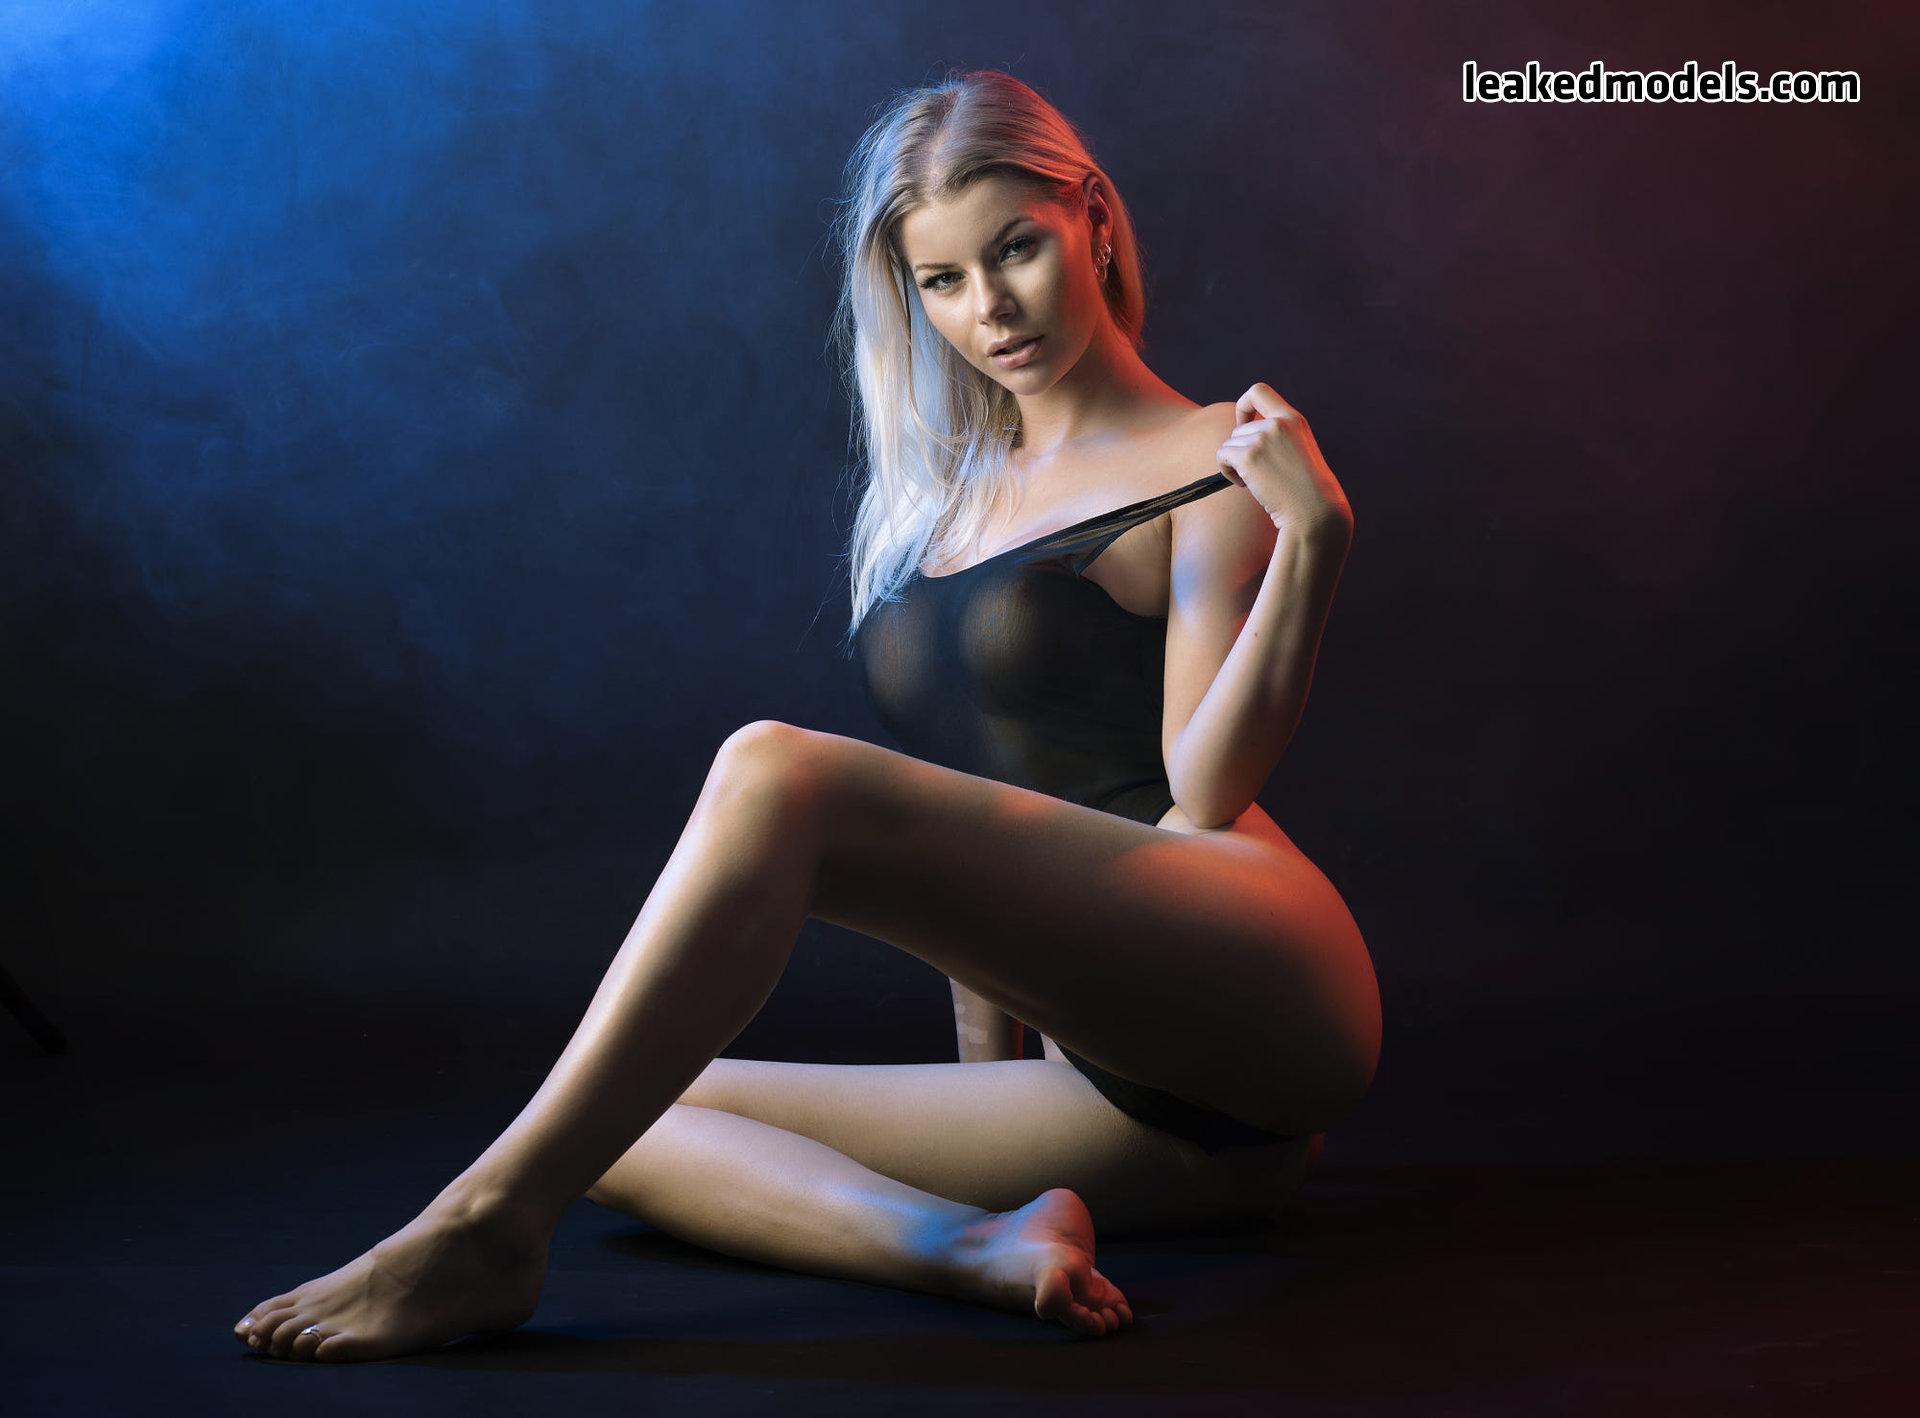 honeybabesugarpiie killeryina leaked nude leakedmodels.com 0028 - Viktoria – Honeybabesugarpiie killeryina OnlyFans Nude Leaks (30 Photos)